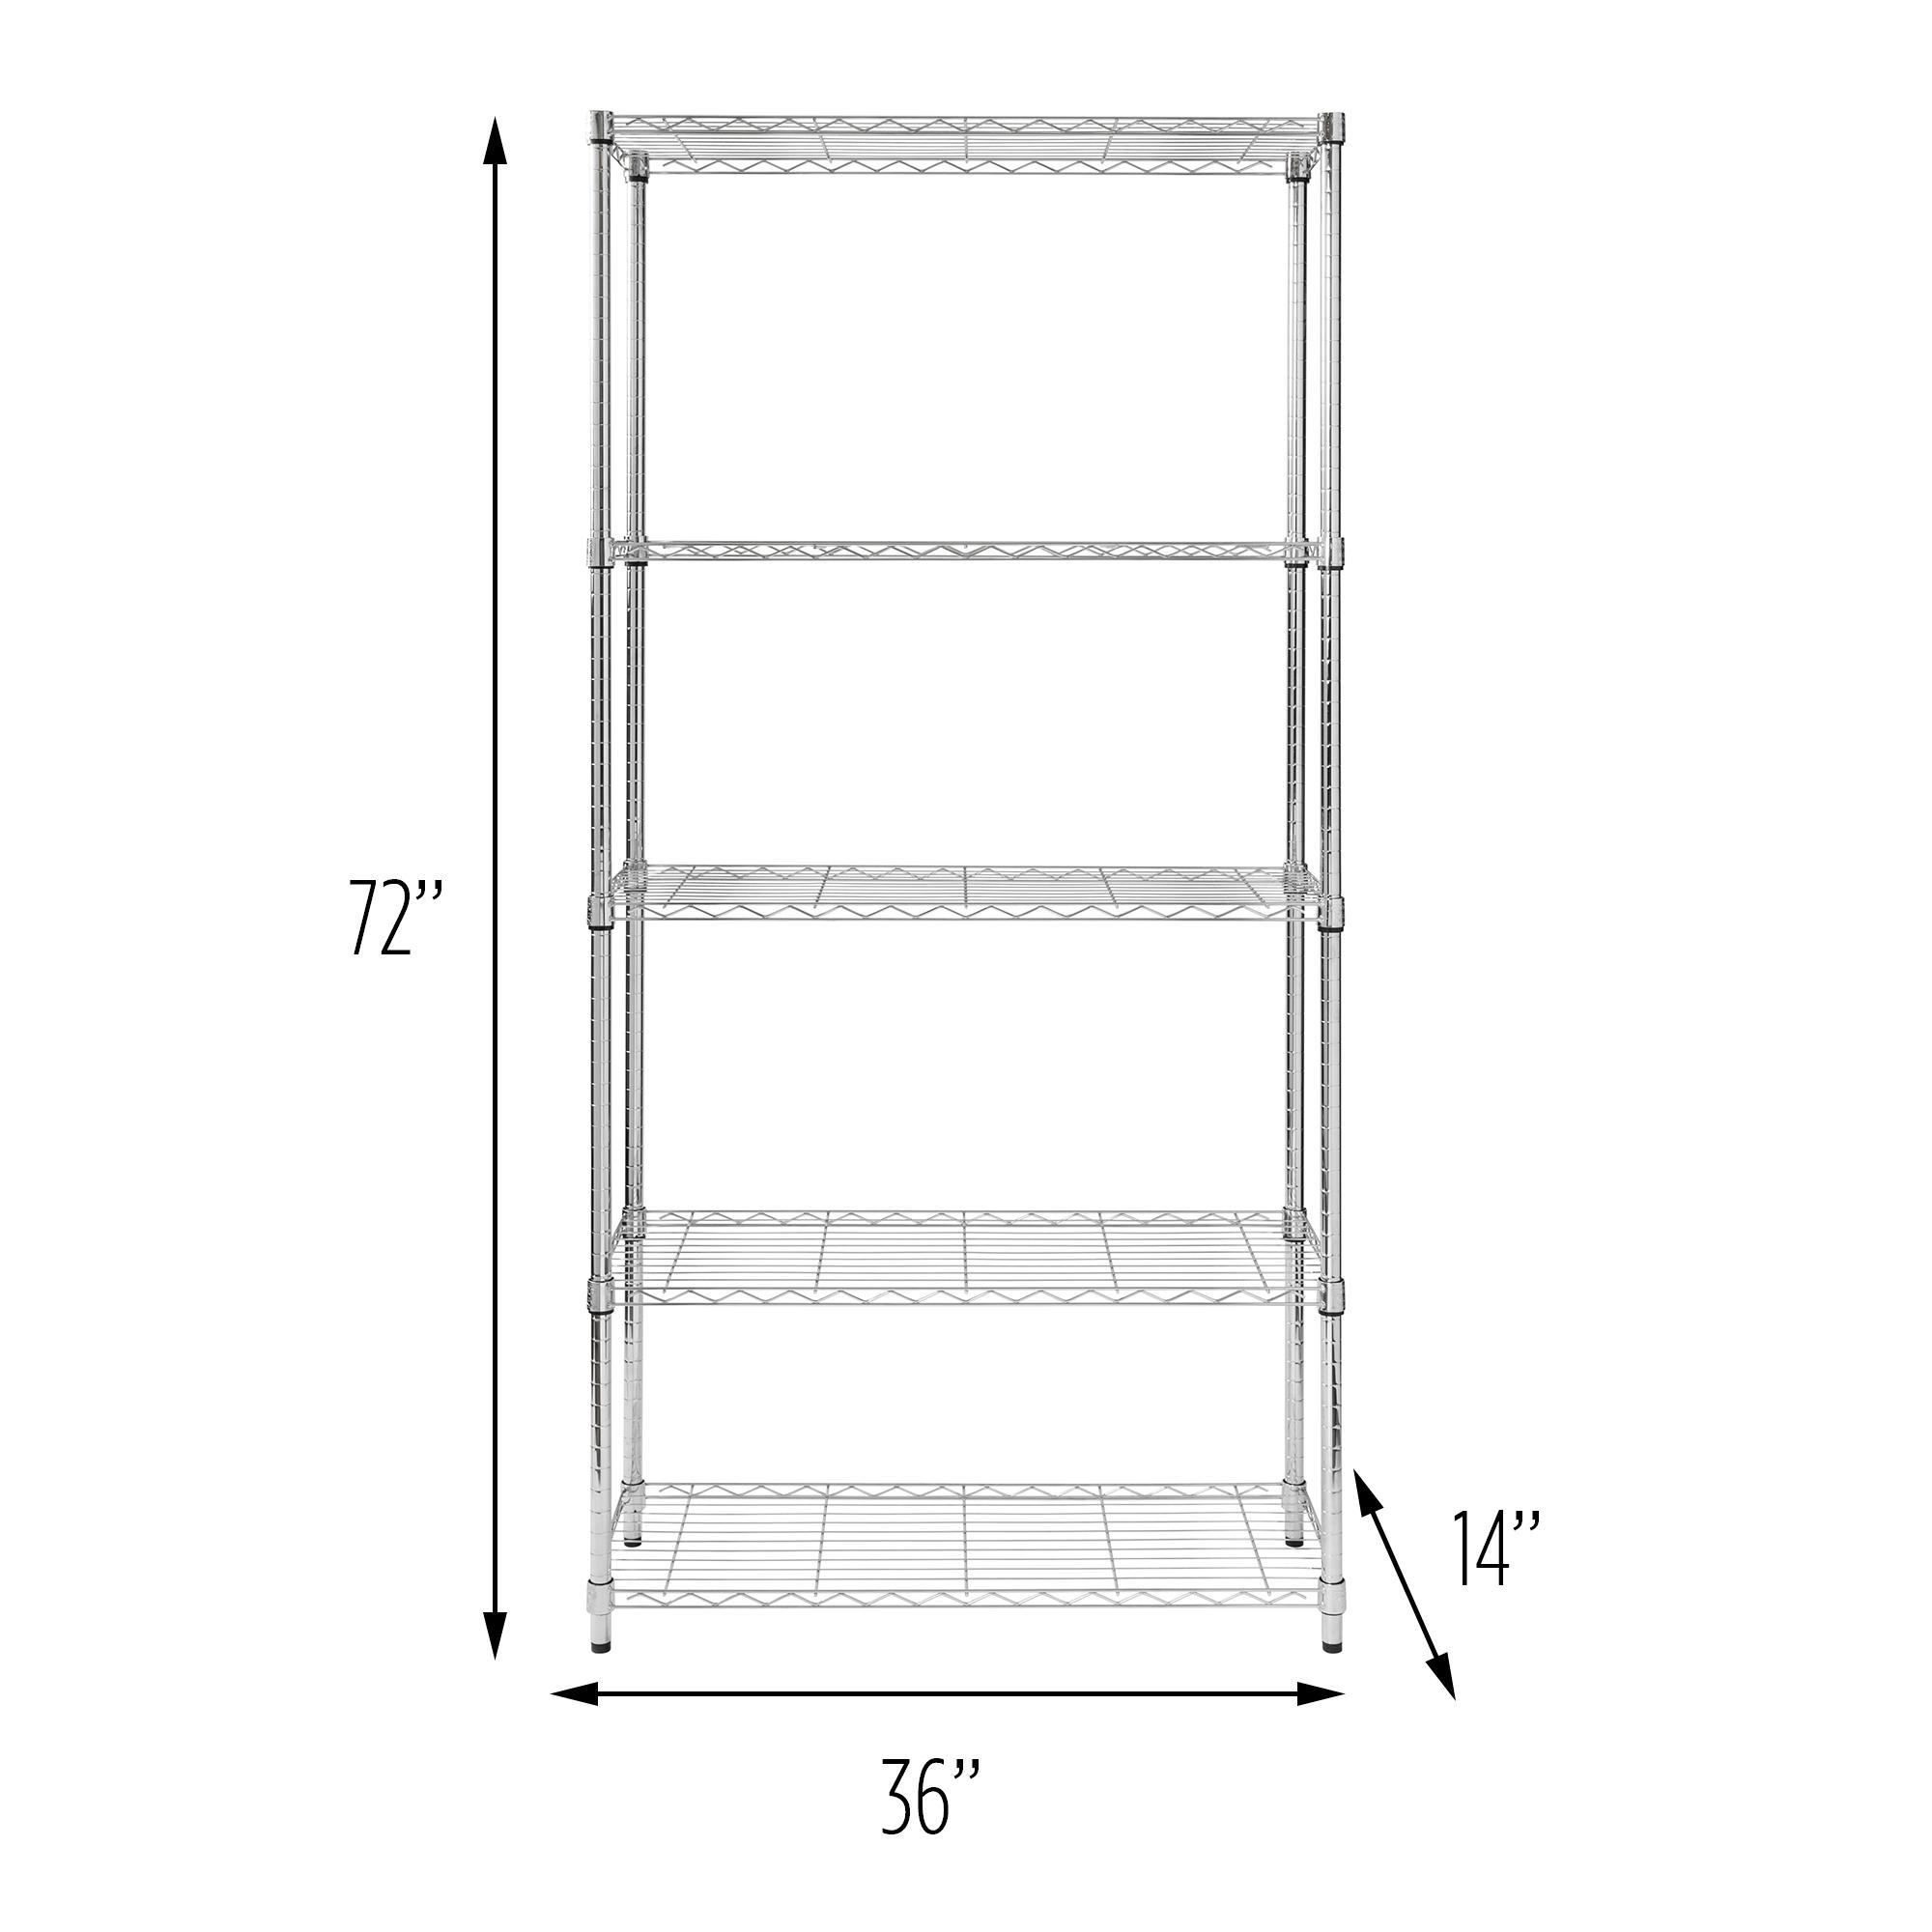 18 x 60 x 63 5 Tier Adjustable Wall Mount Shelving Kit